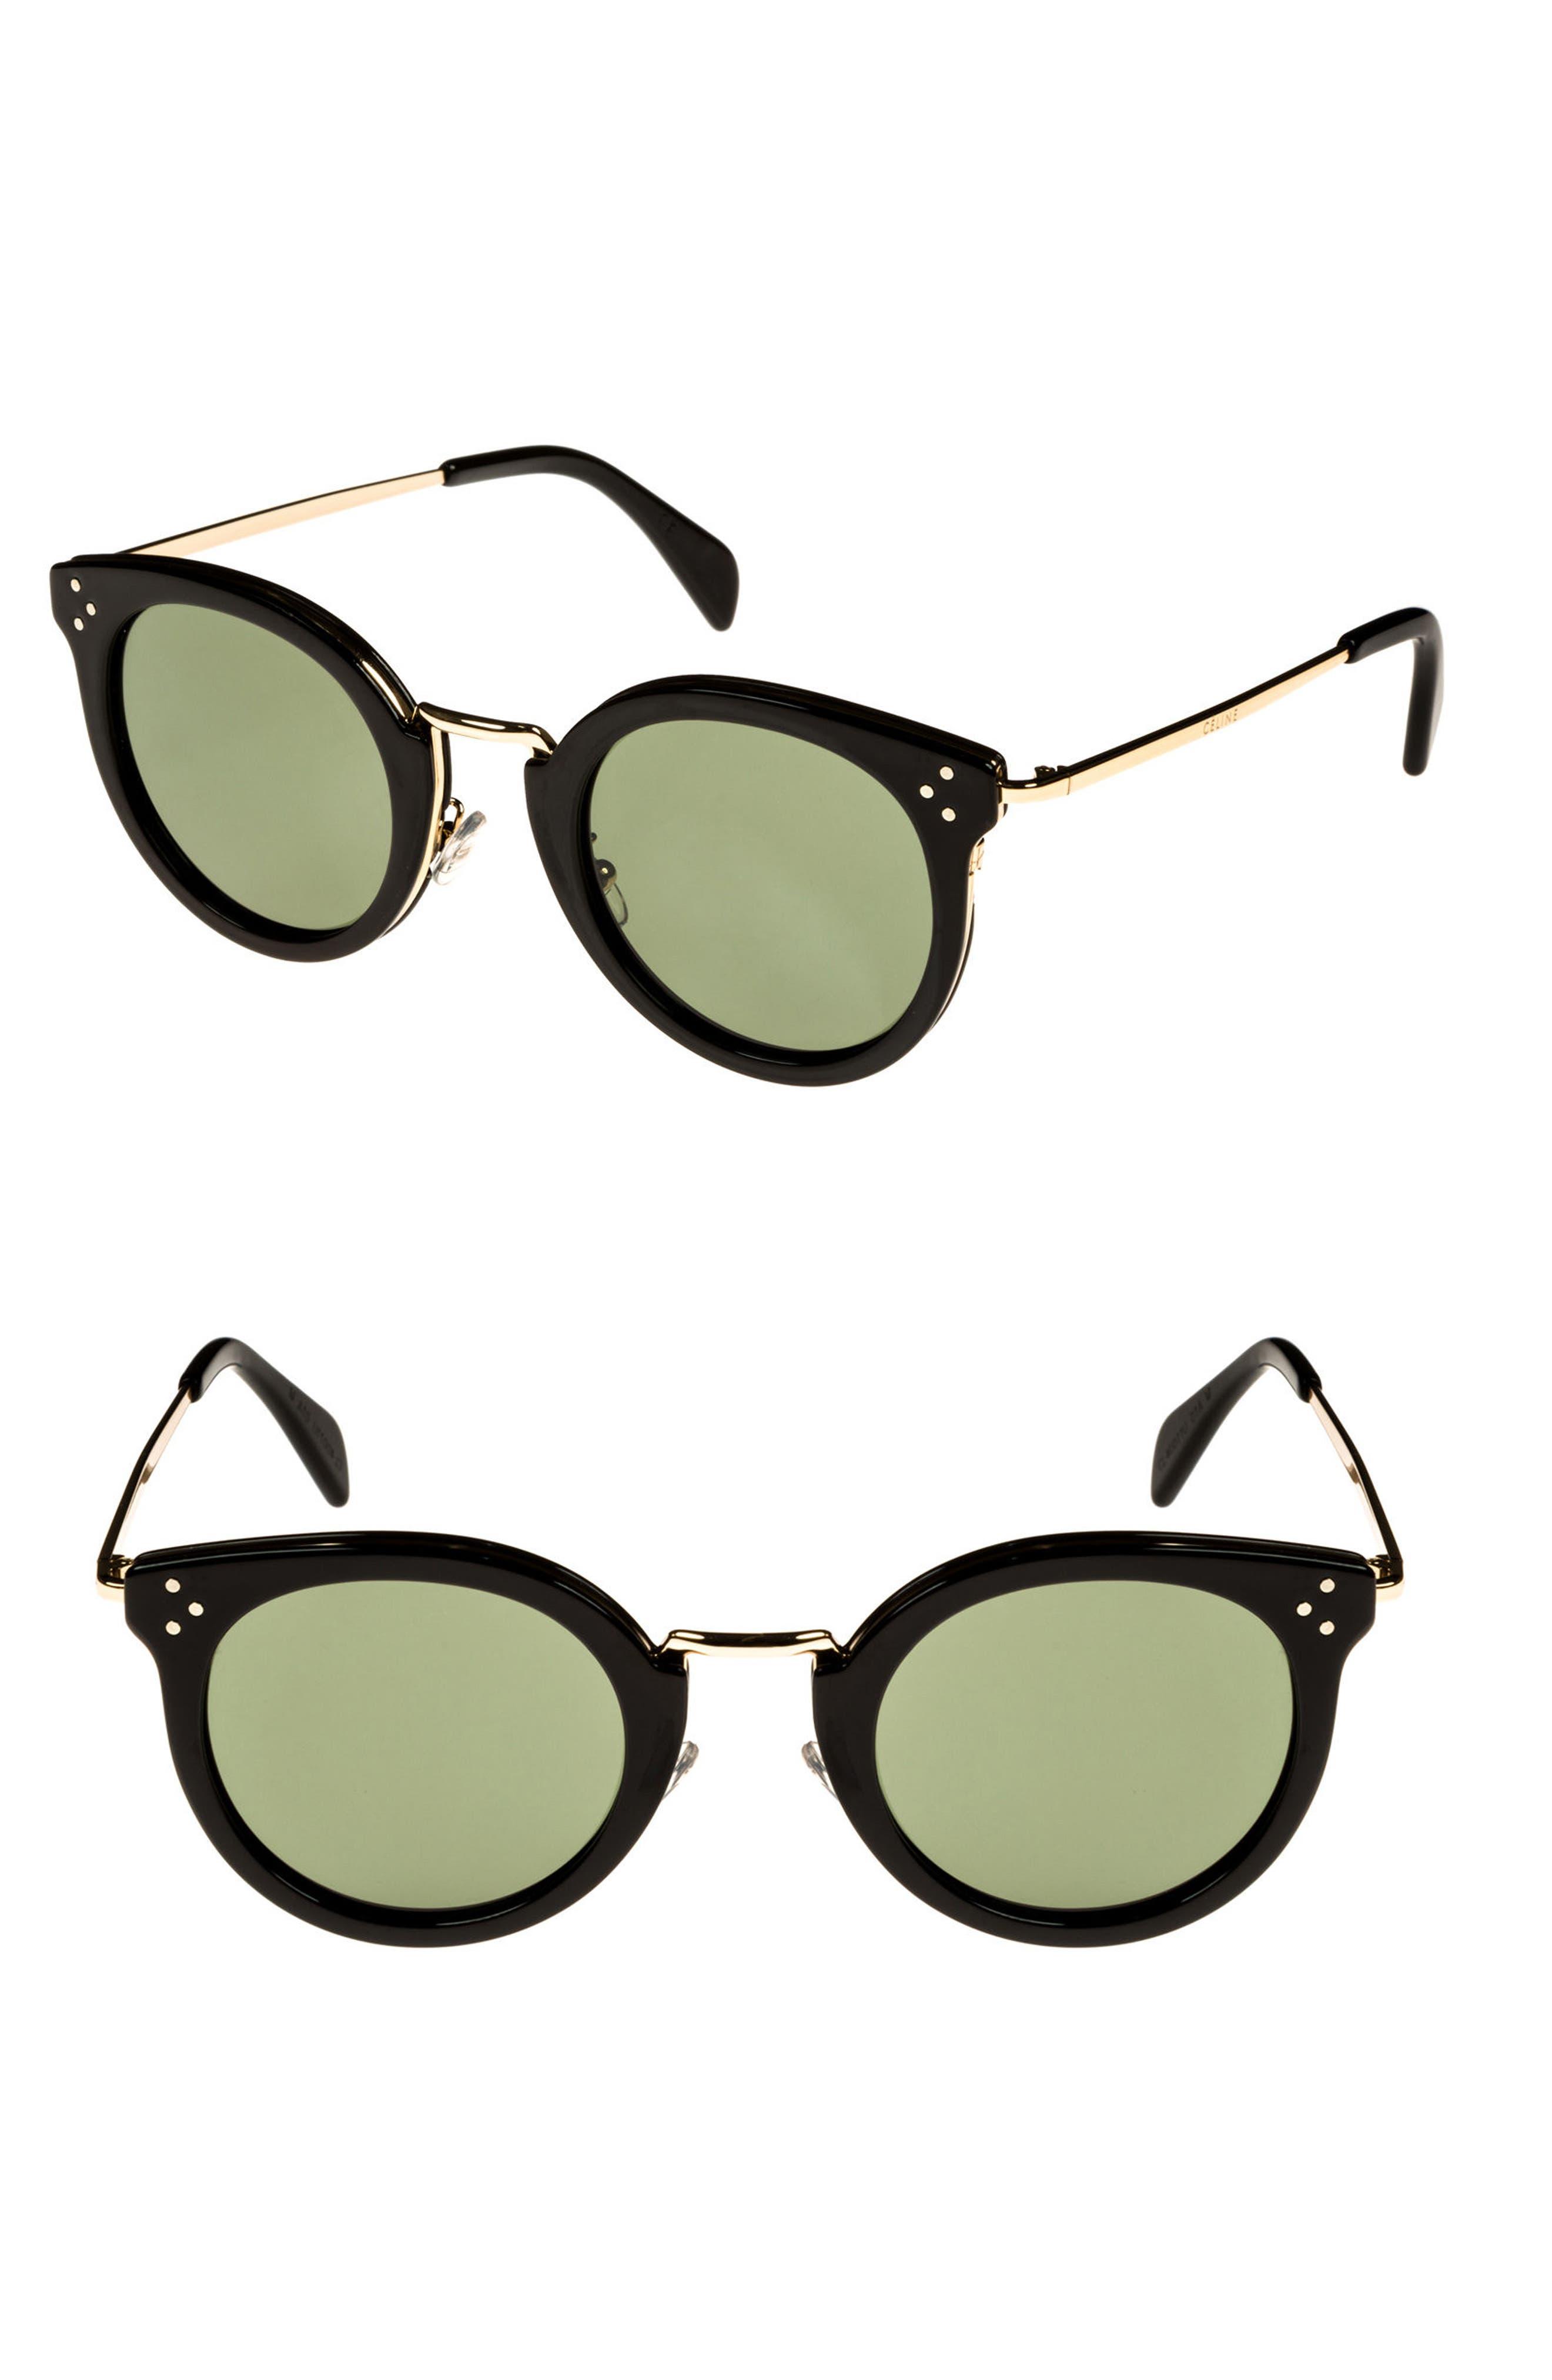 49mm Round Sunglasses,                         Main,                         color, BLACK/ PALE GOLD/ SMOKE